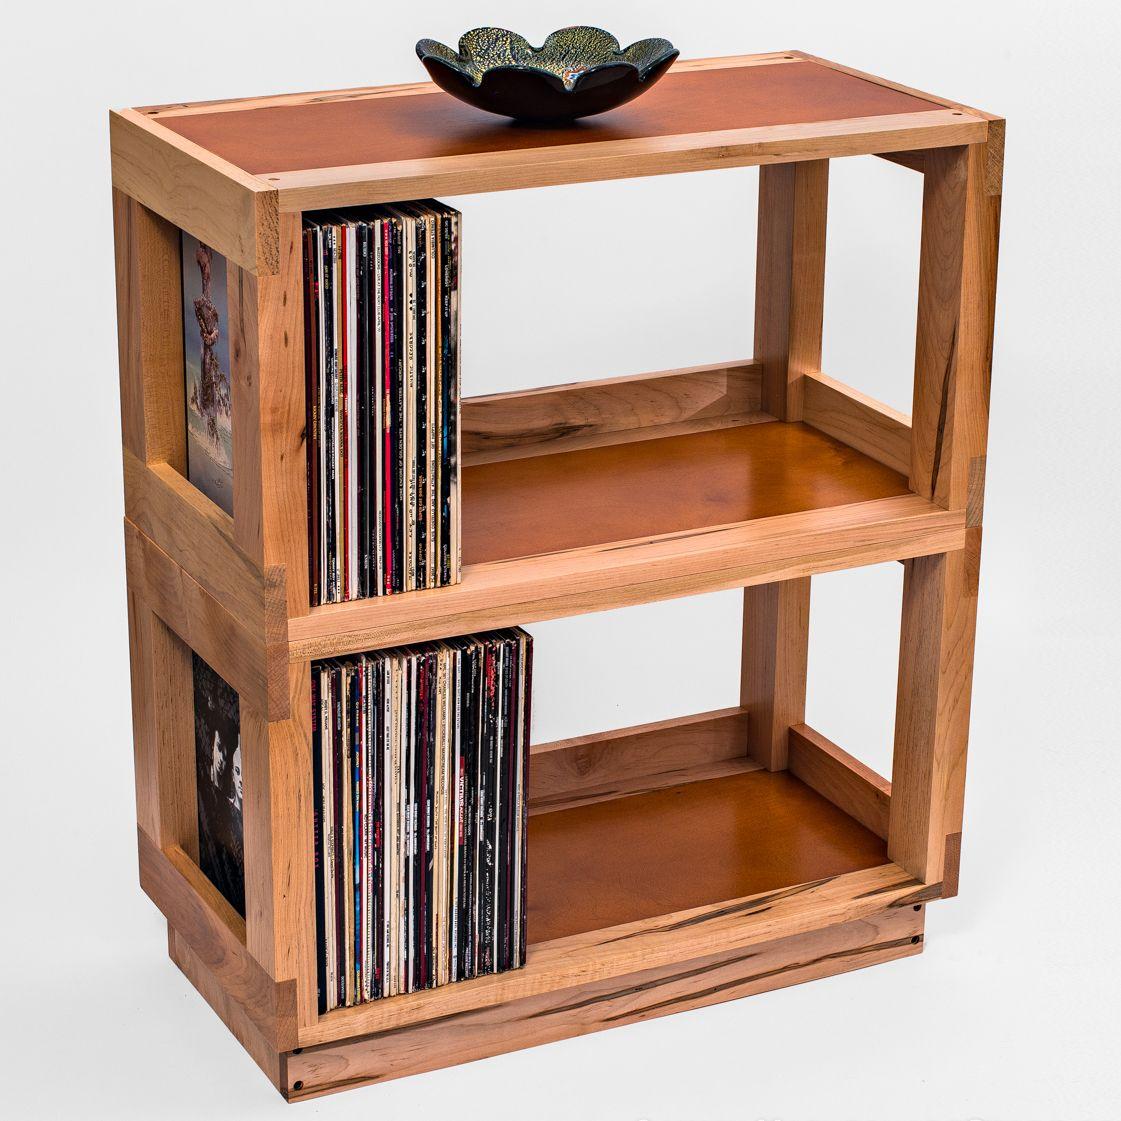 27 vinyl record storage and shelving solutions vinyl